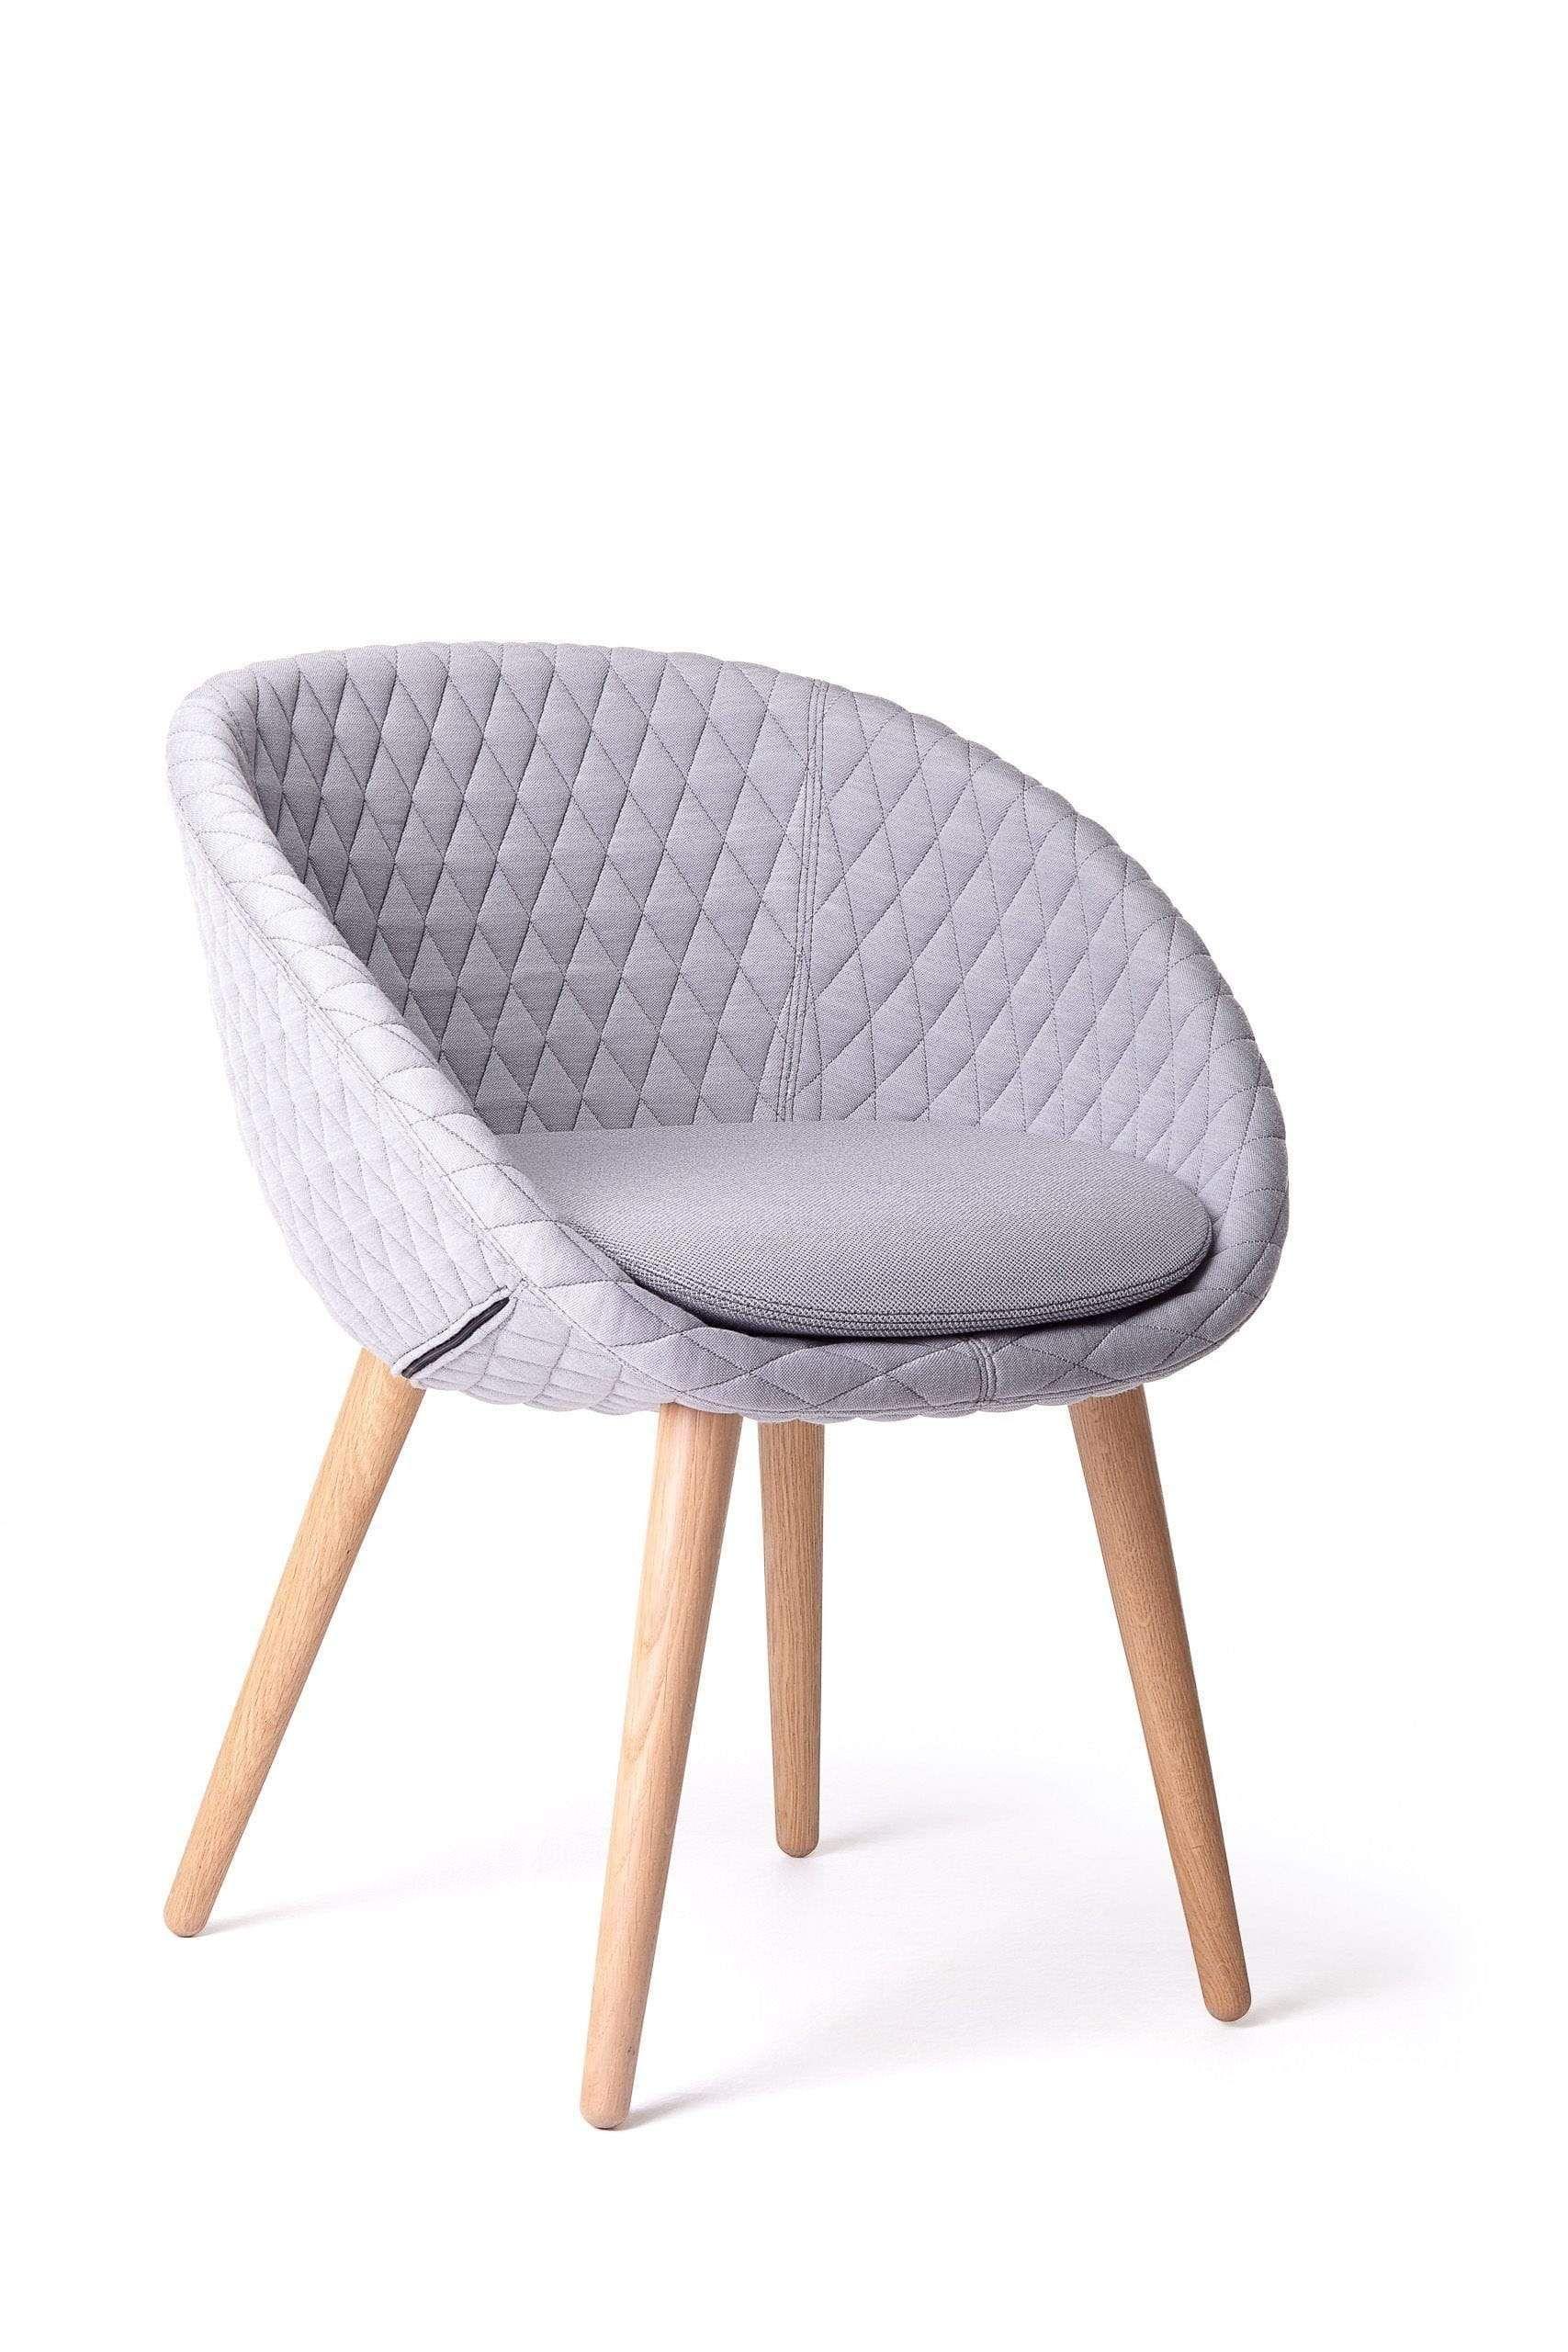 Love Dining Chair - Cat. LII / 22.8x22.8x29.9x18.9